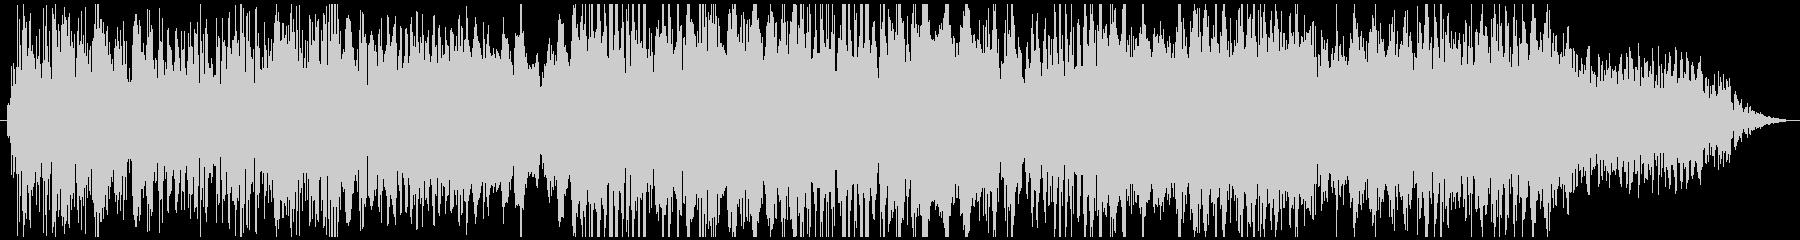 PADS ウォブルリボルバー01の未再生の波形